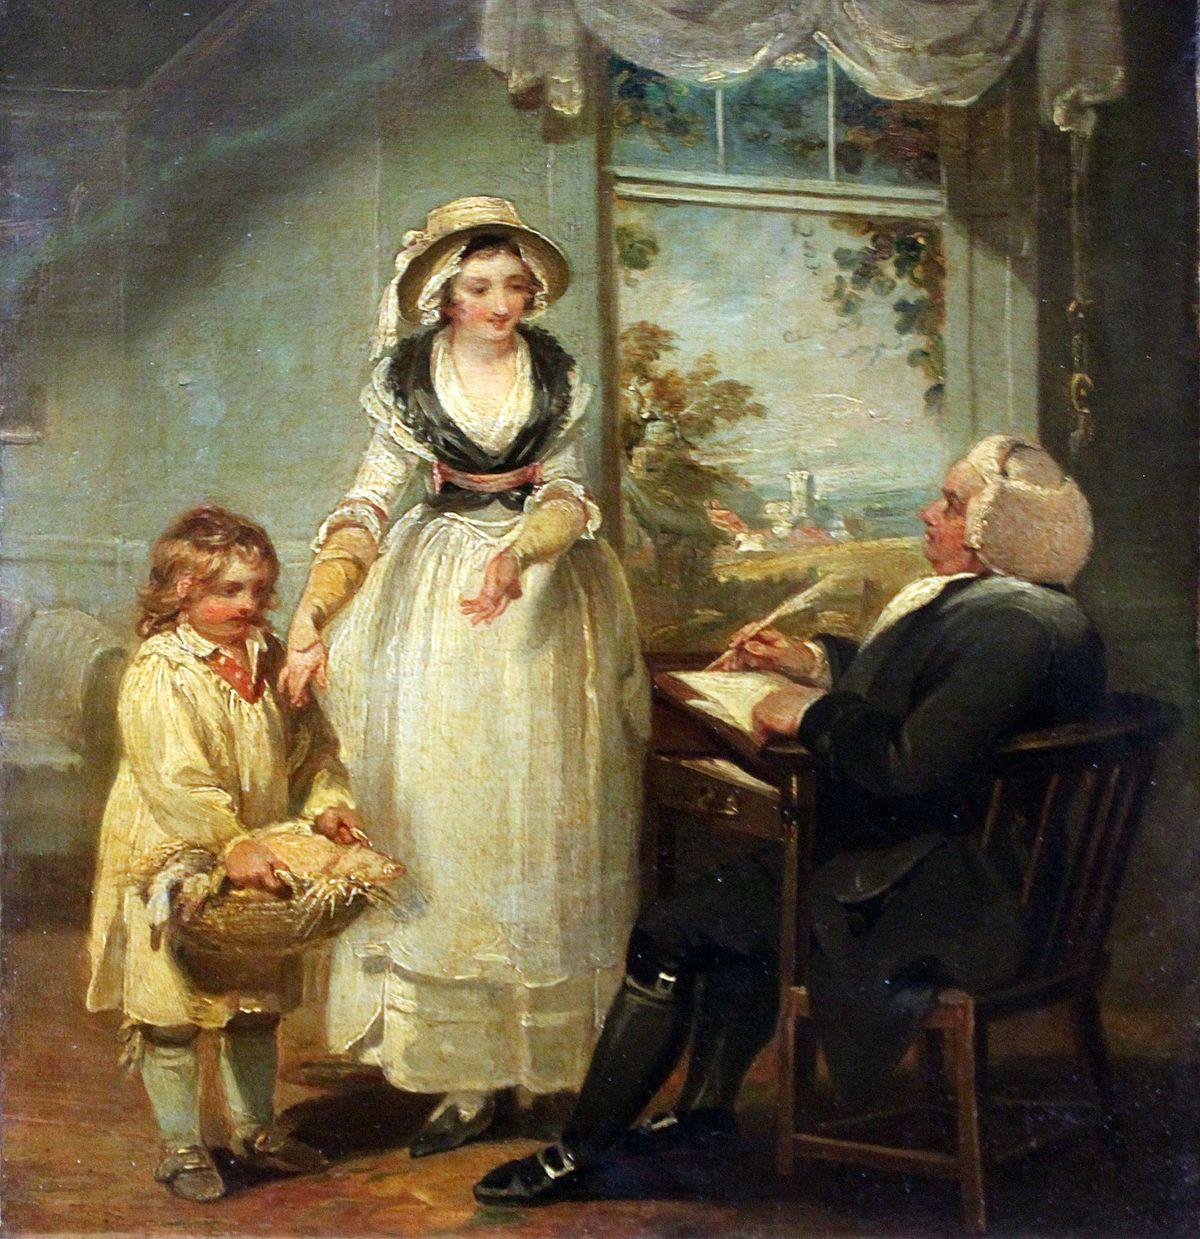 Mary Singleton Painting - The Promise | Artist Mary Singleton ...